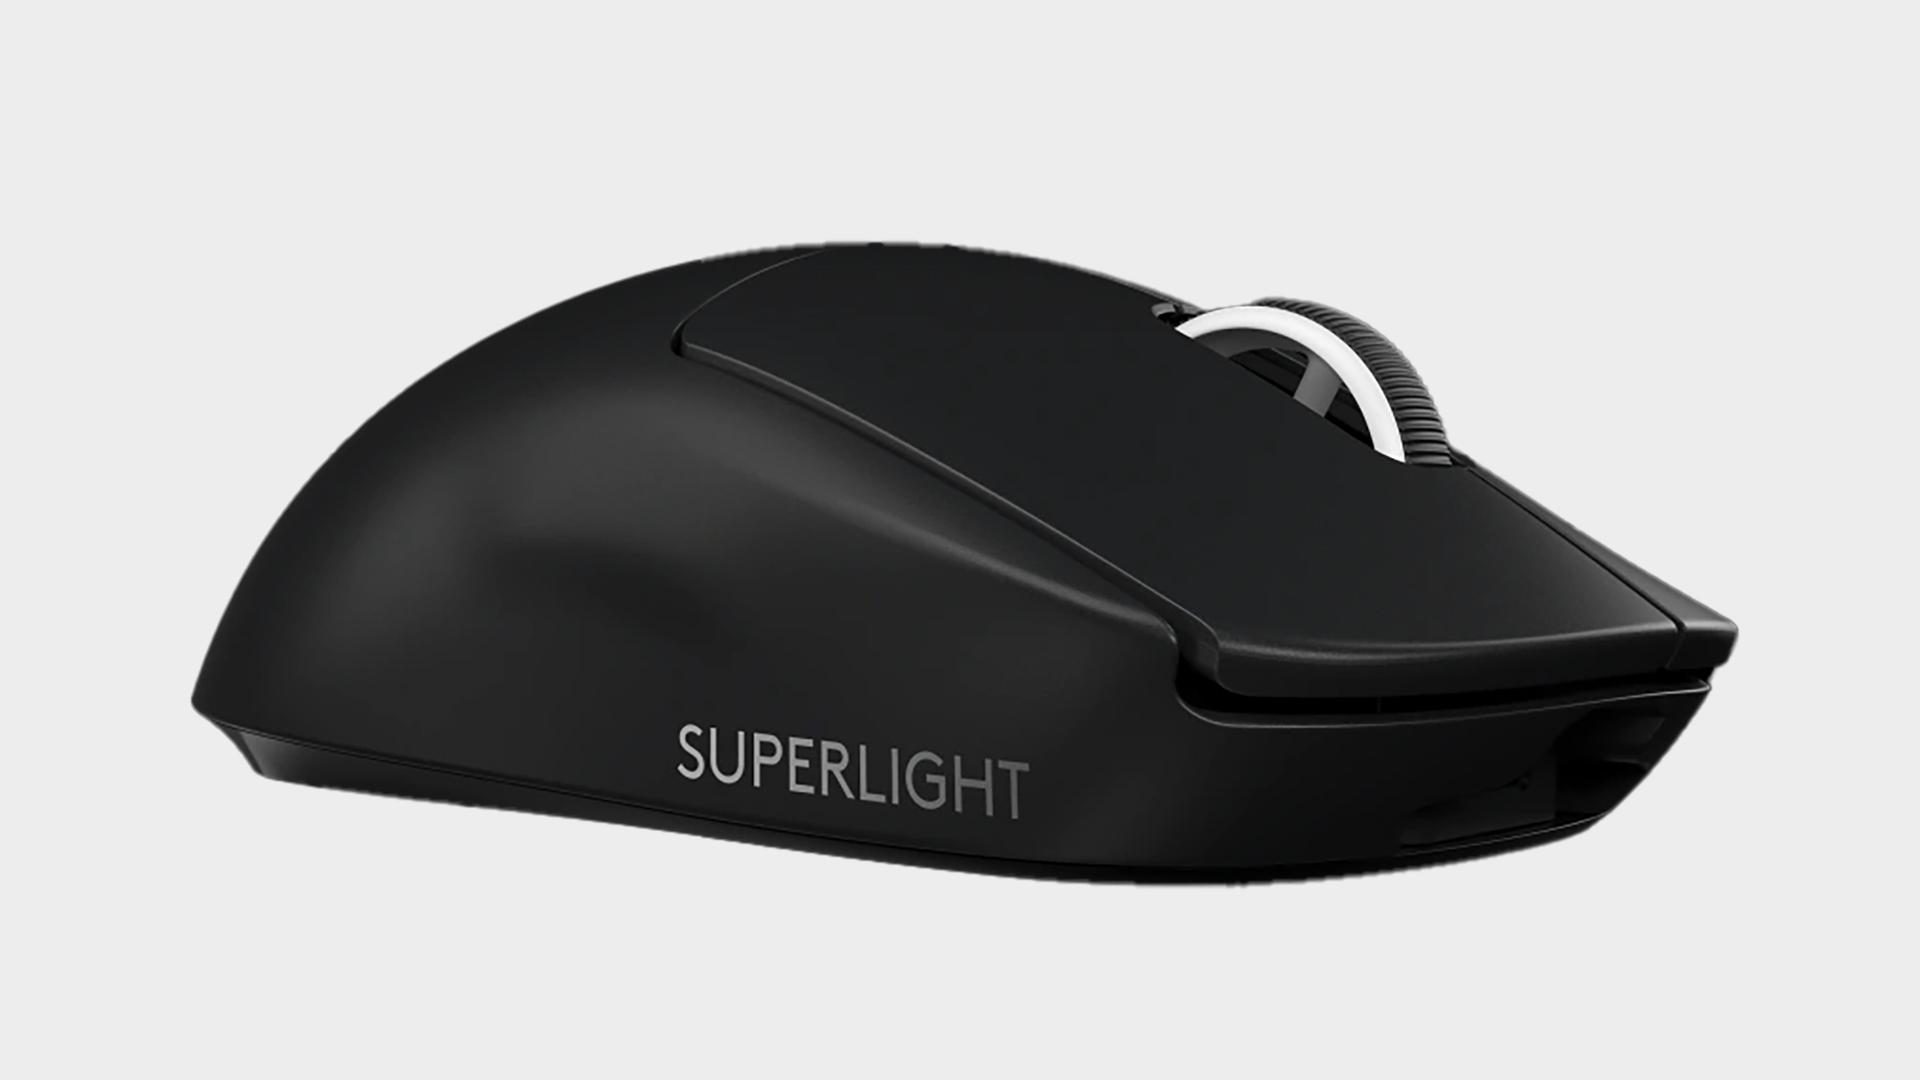 Logitech G Pro X Superlight wireless gaming mouse on grey background